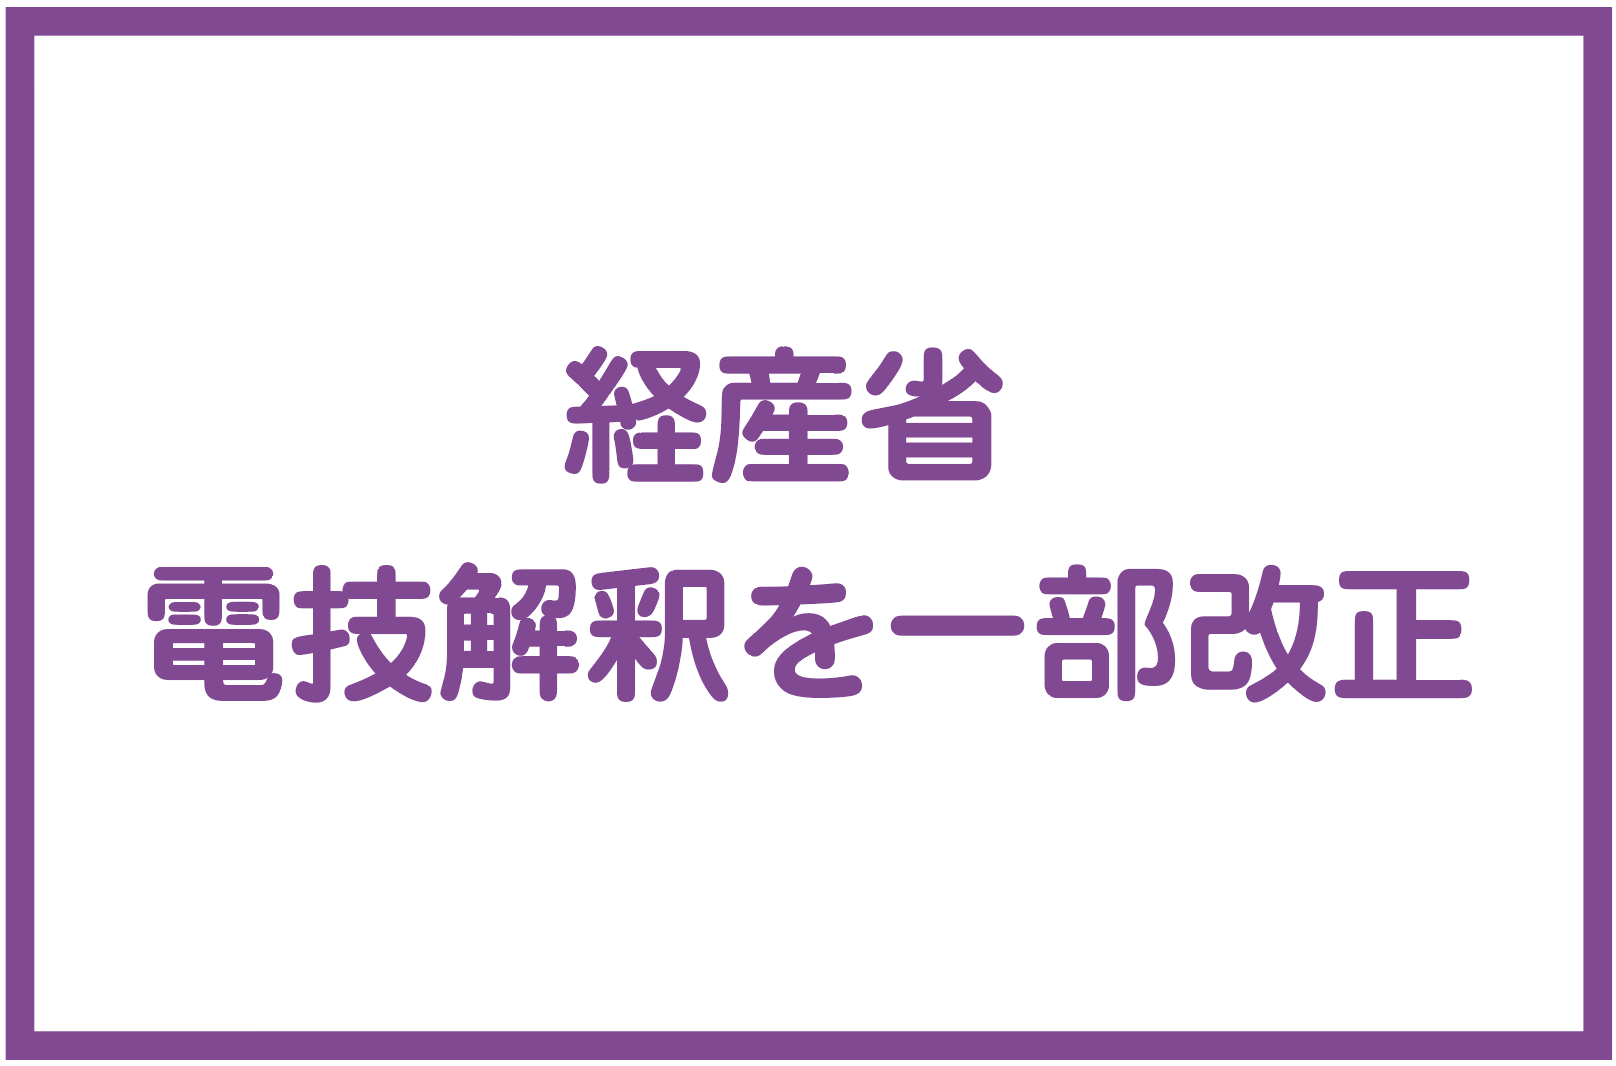 【経産省】電技解釈を一部改正の画像